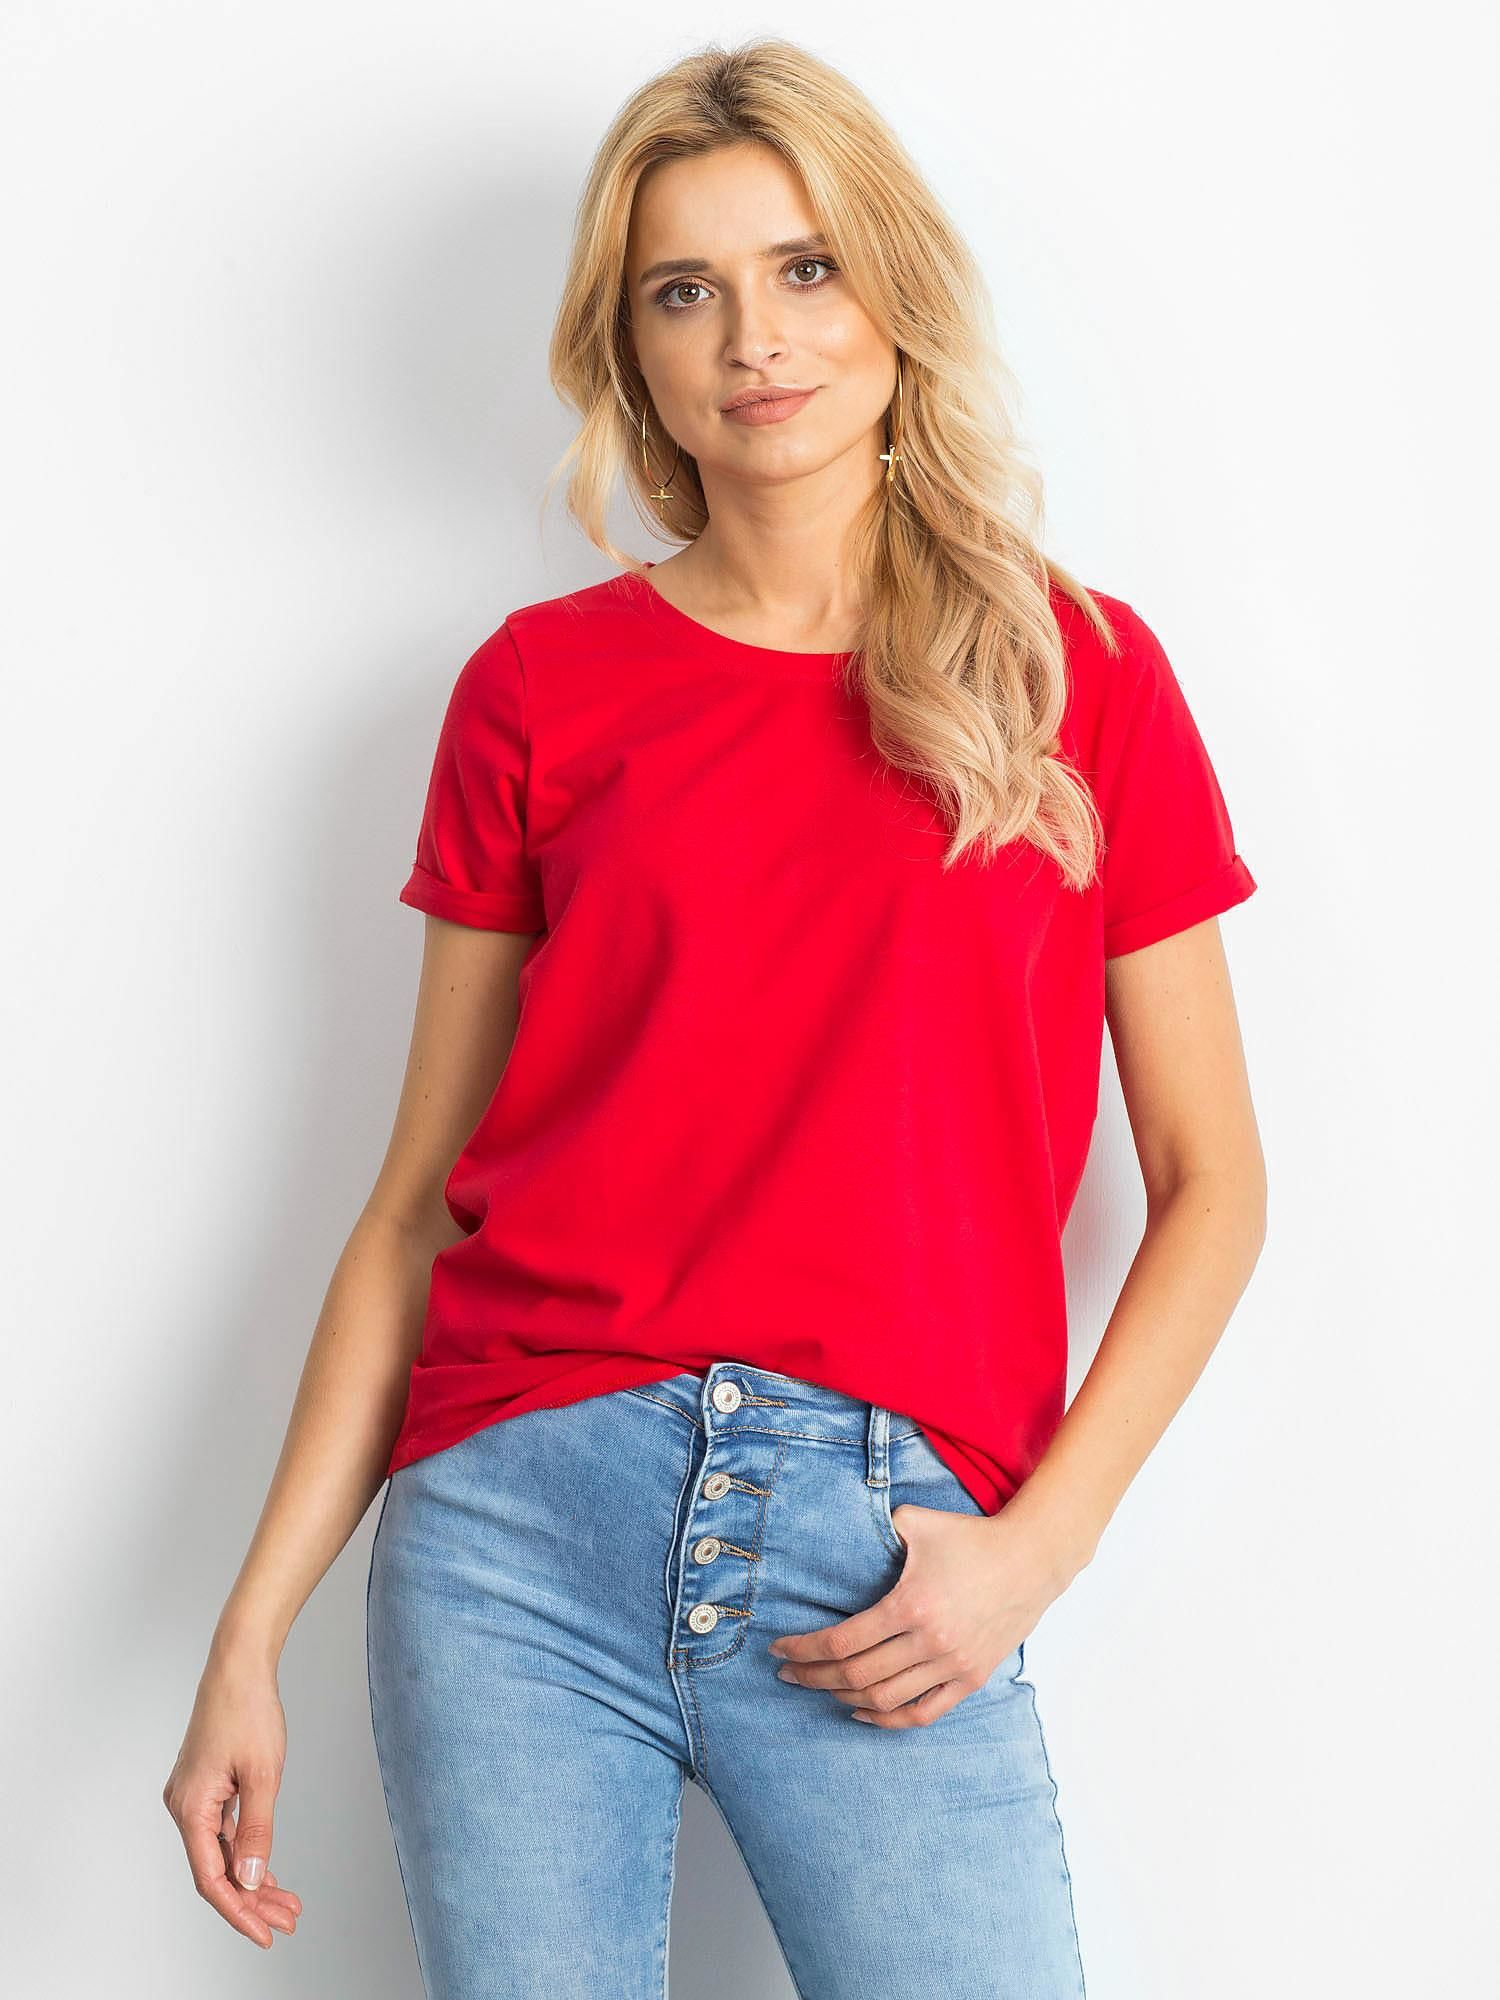 Dámske červené bavlnené tričko - XS